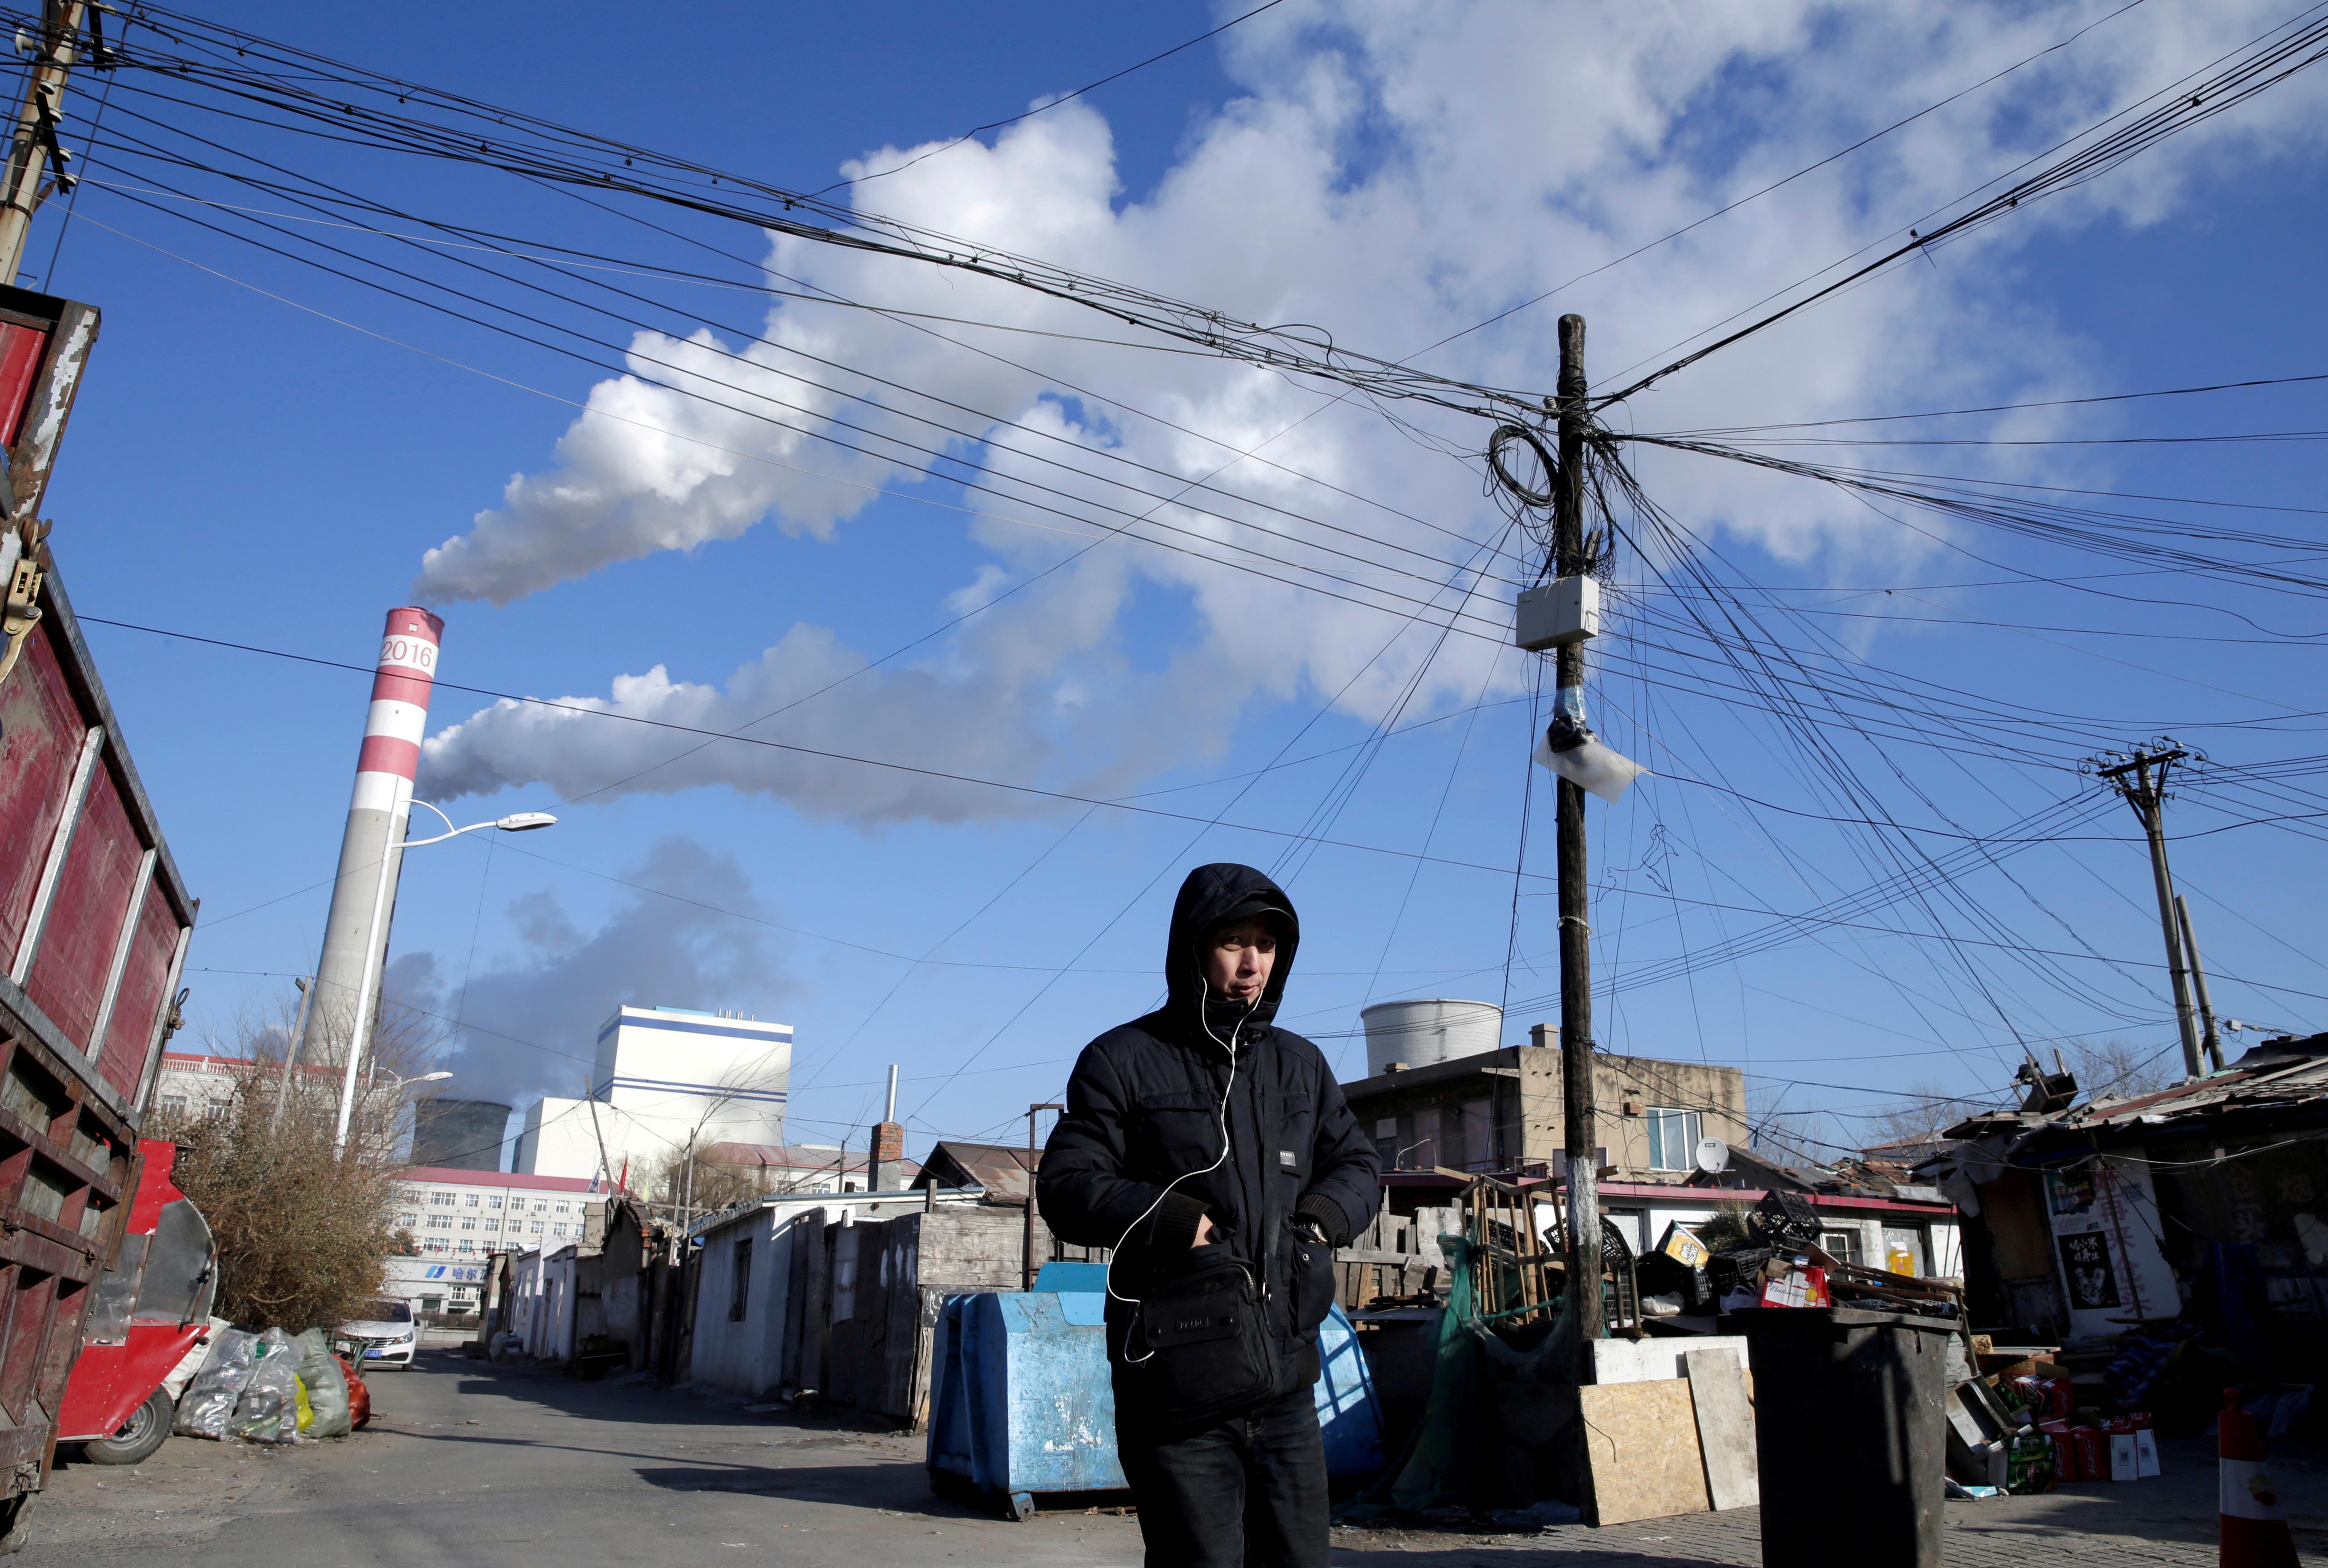 A man walks near a coal-fired power plant in Harbin, Heilongjiang province, China November 27, 2019. Picture taken November 27, 2019. REUTERS/Jason Lee/File Photo